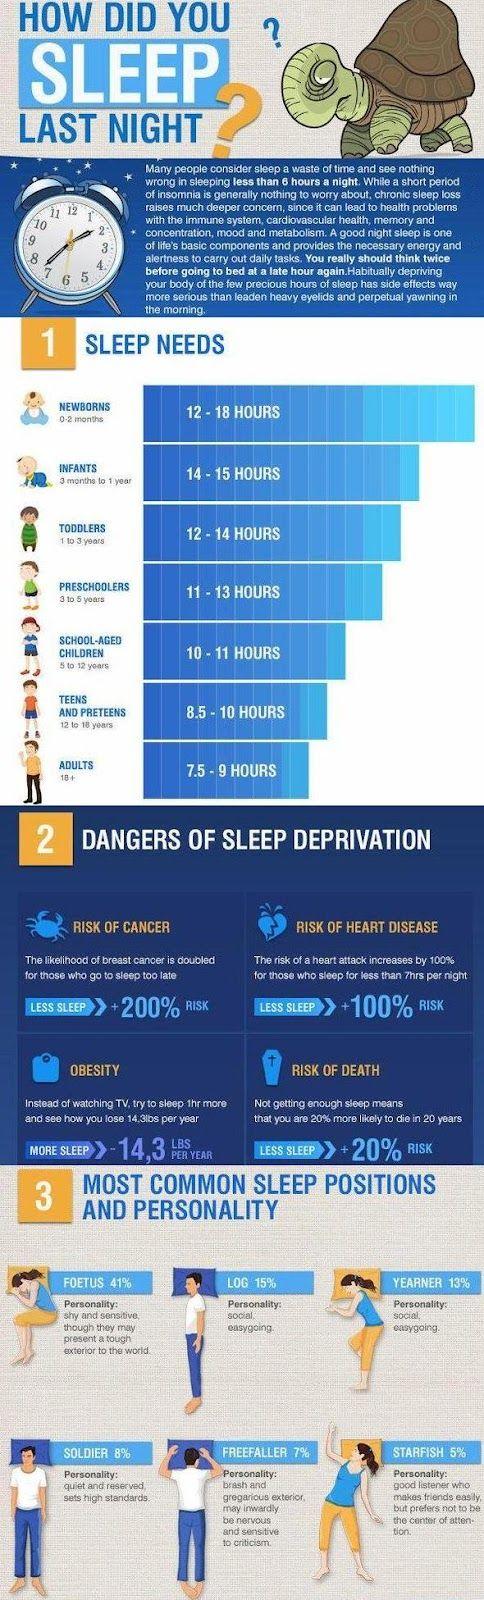 Sleep and Dream Facts Statistics | BlogPad - Digital World |    http://ipadfour.blogspot.com/2012/09/sleep-and-dream-facts-statistics.html